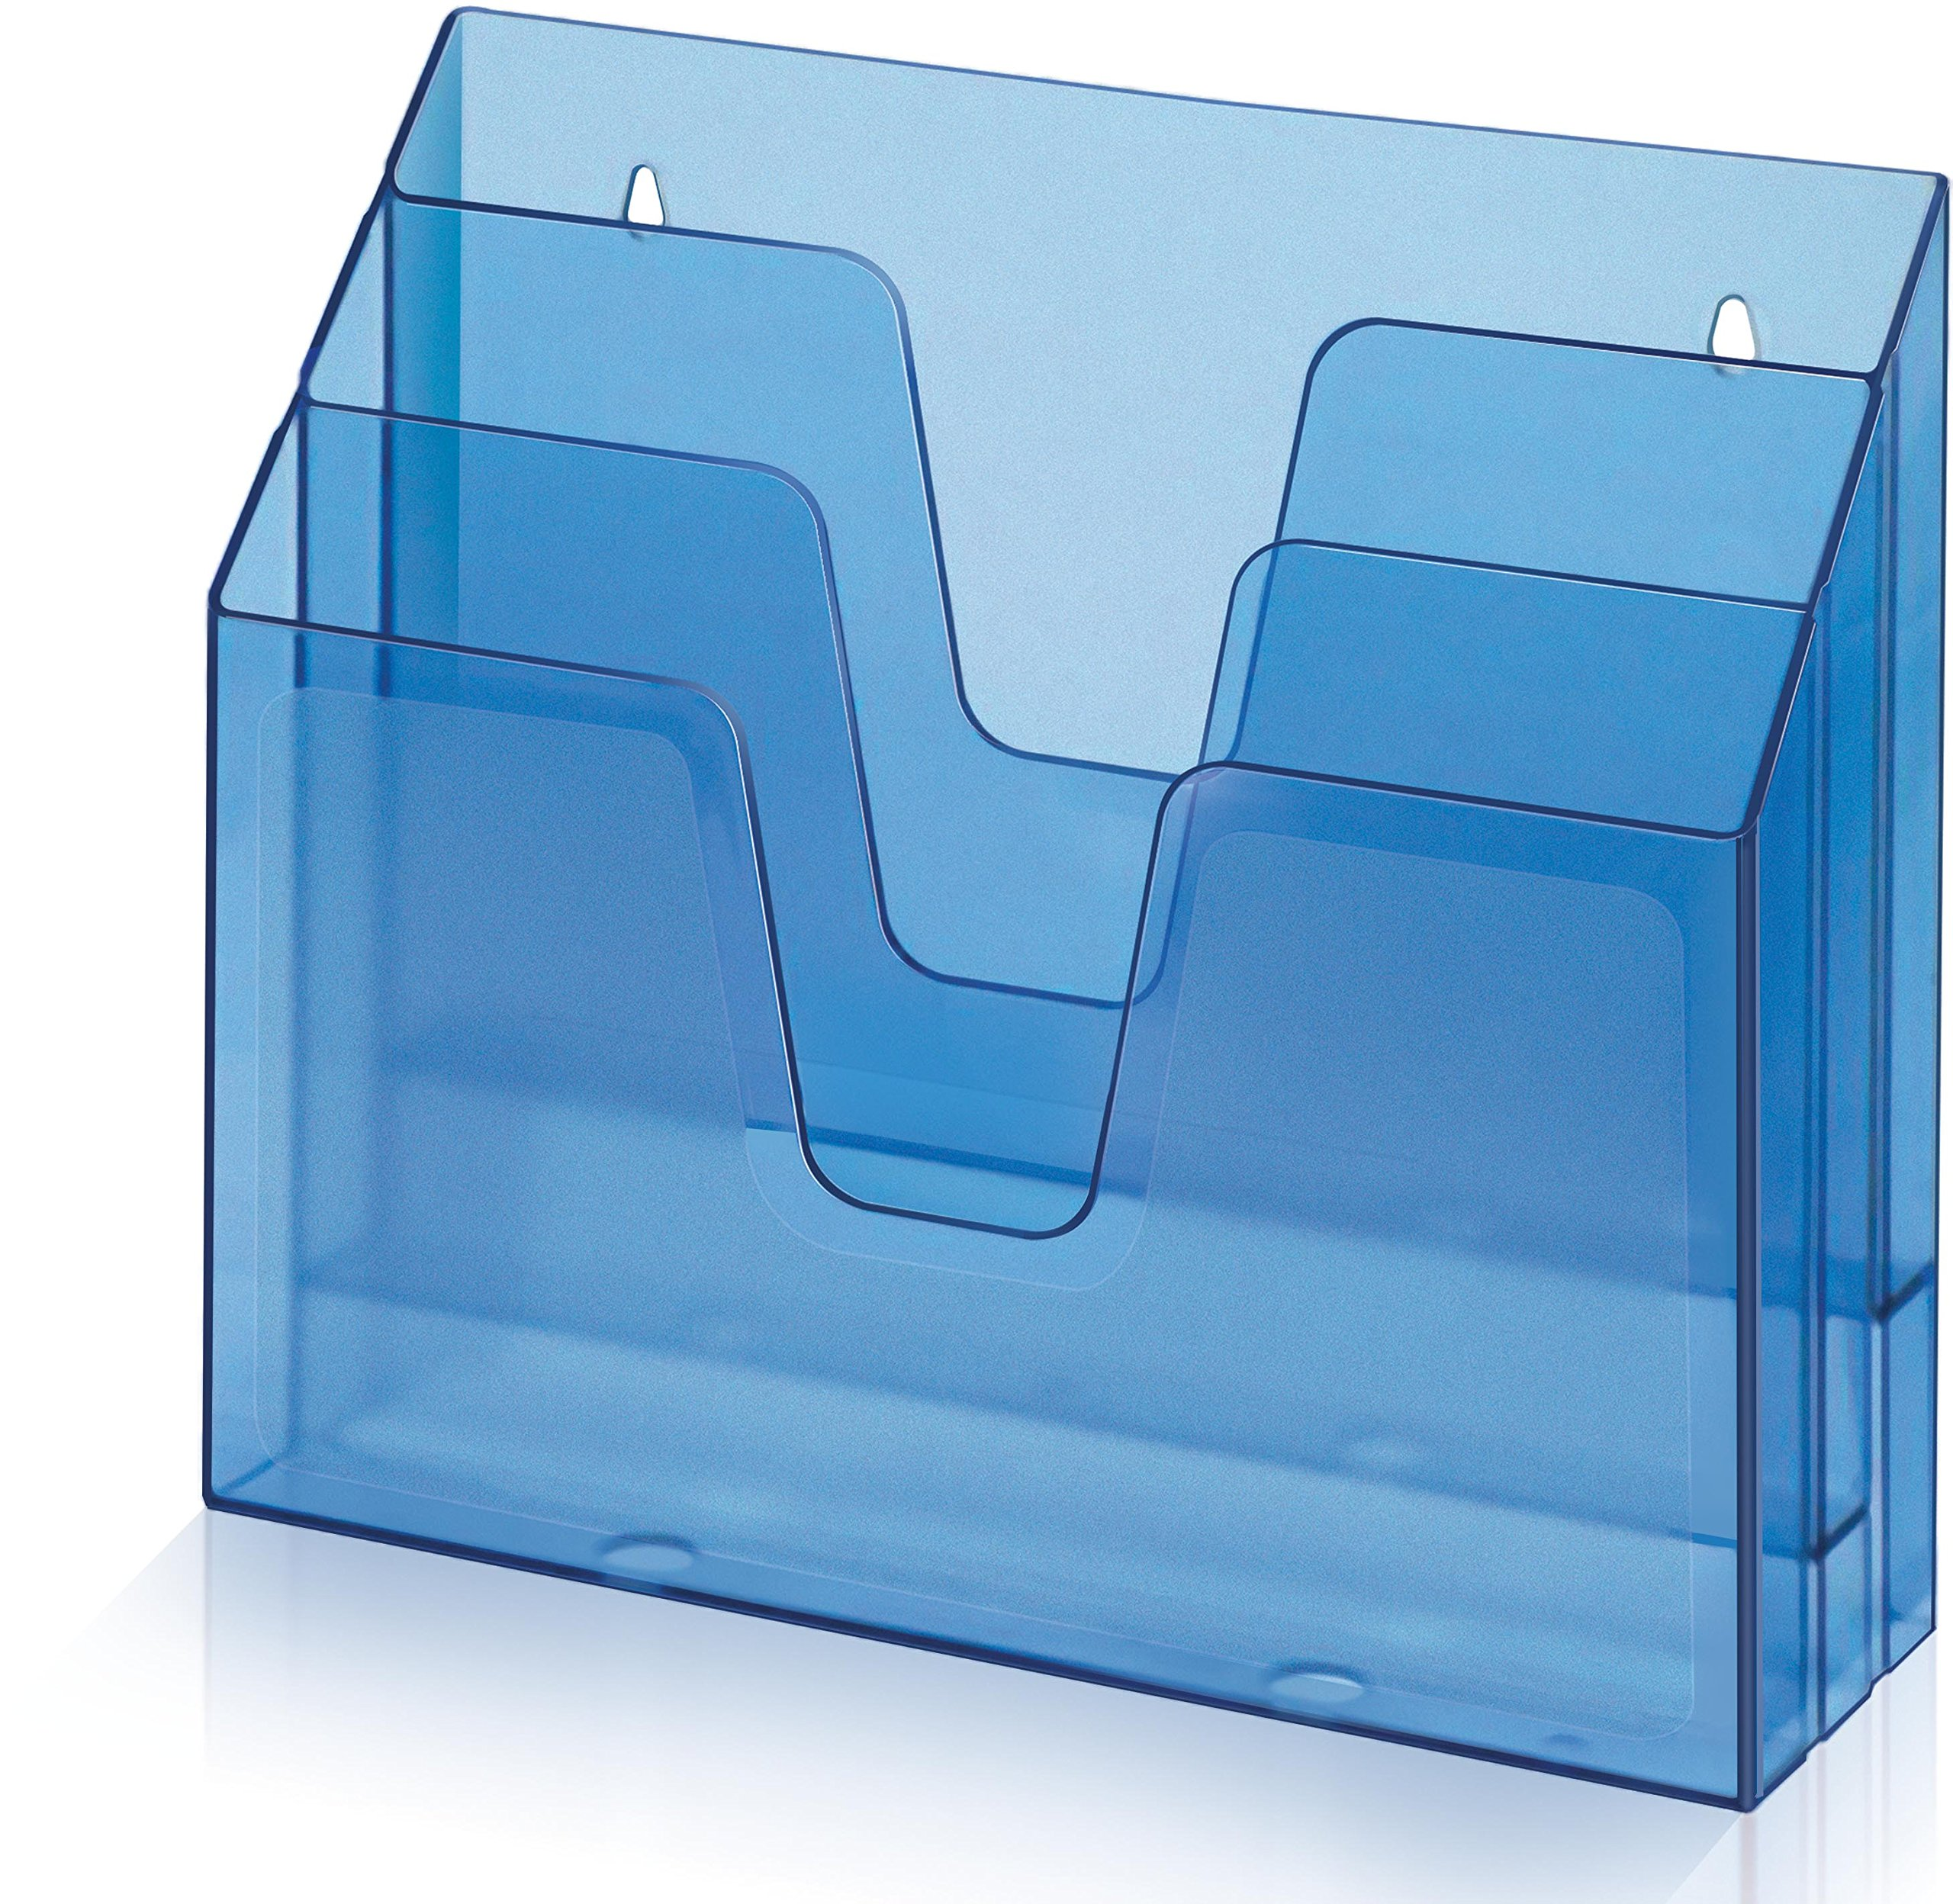 Acrimet Horizontal Triple File Folder Organizer (Clear Blue Color)